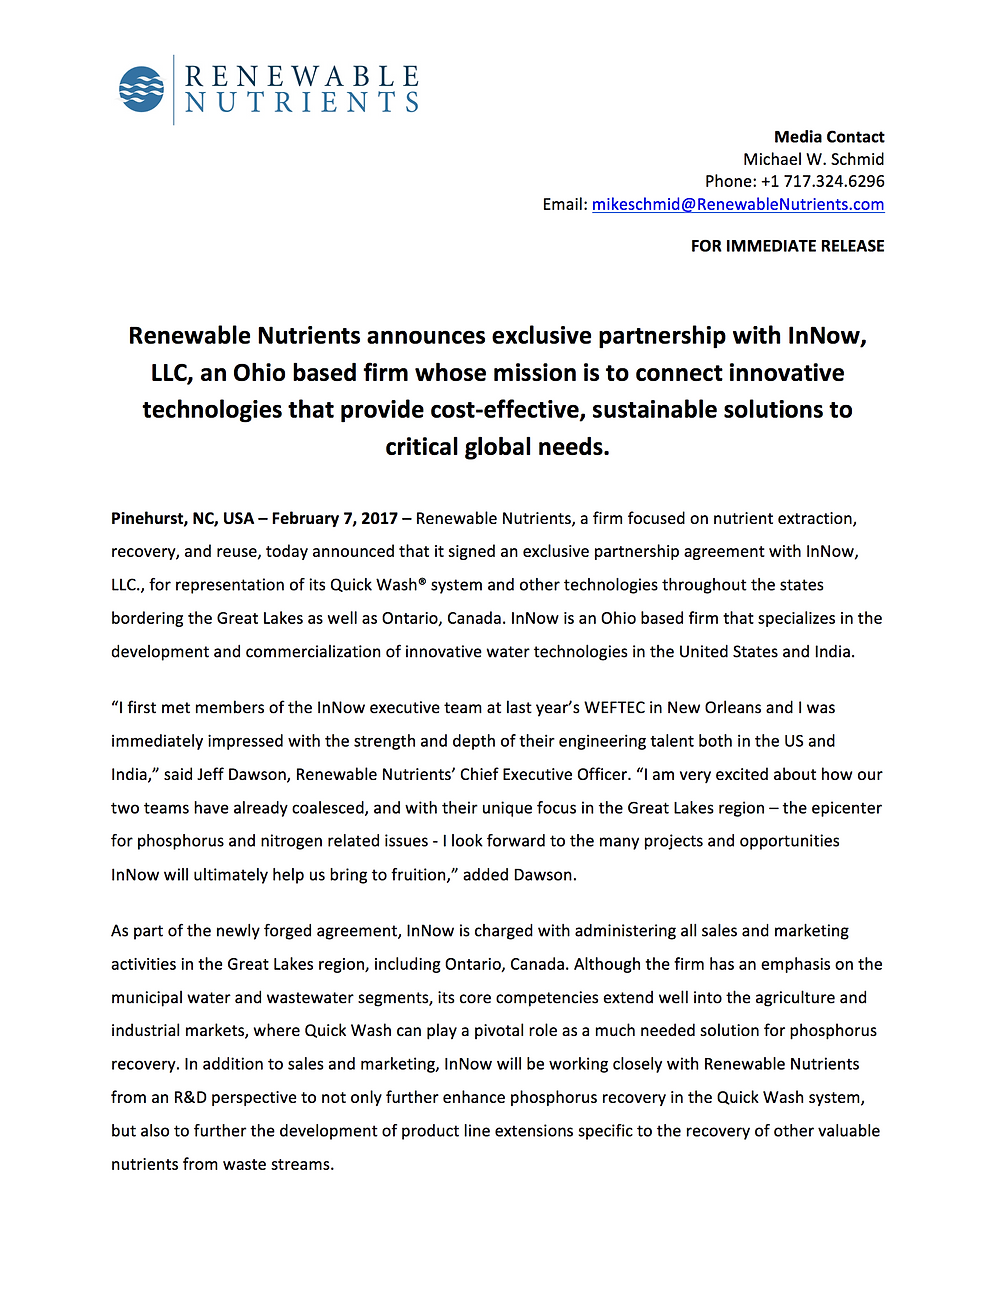 InNow Press Release